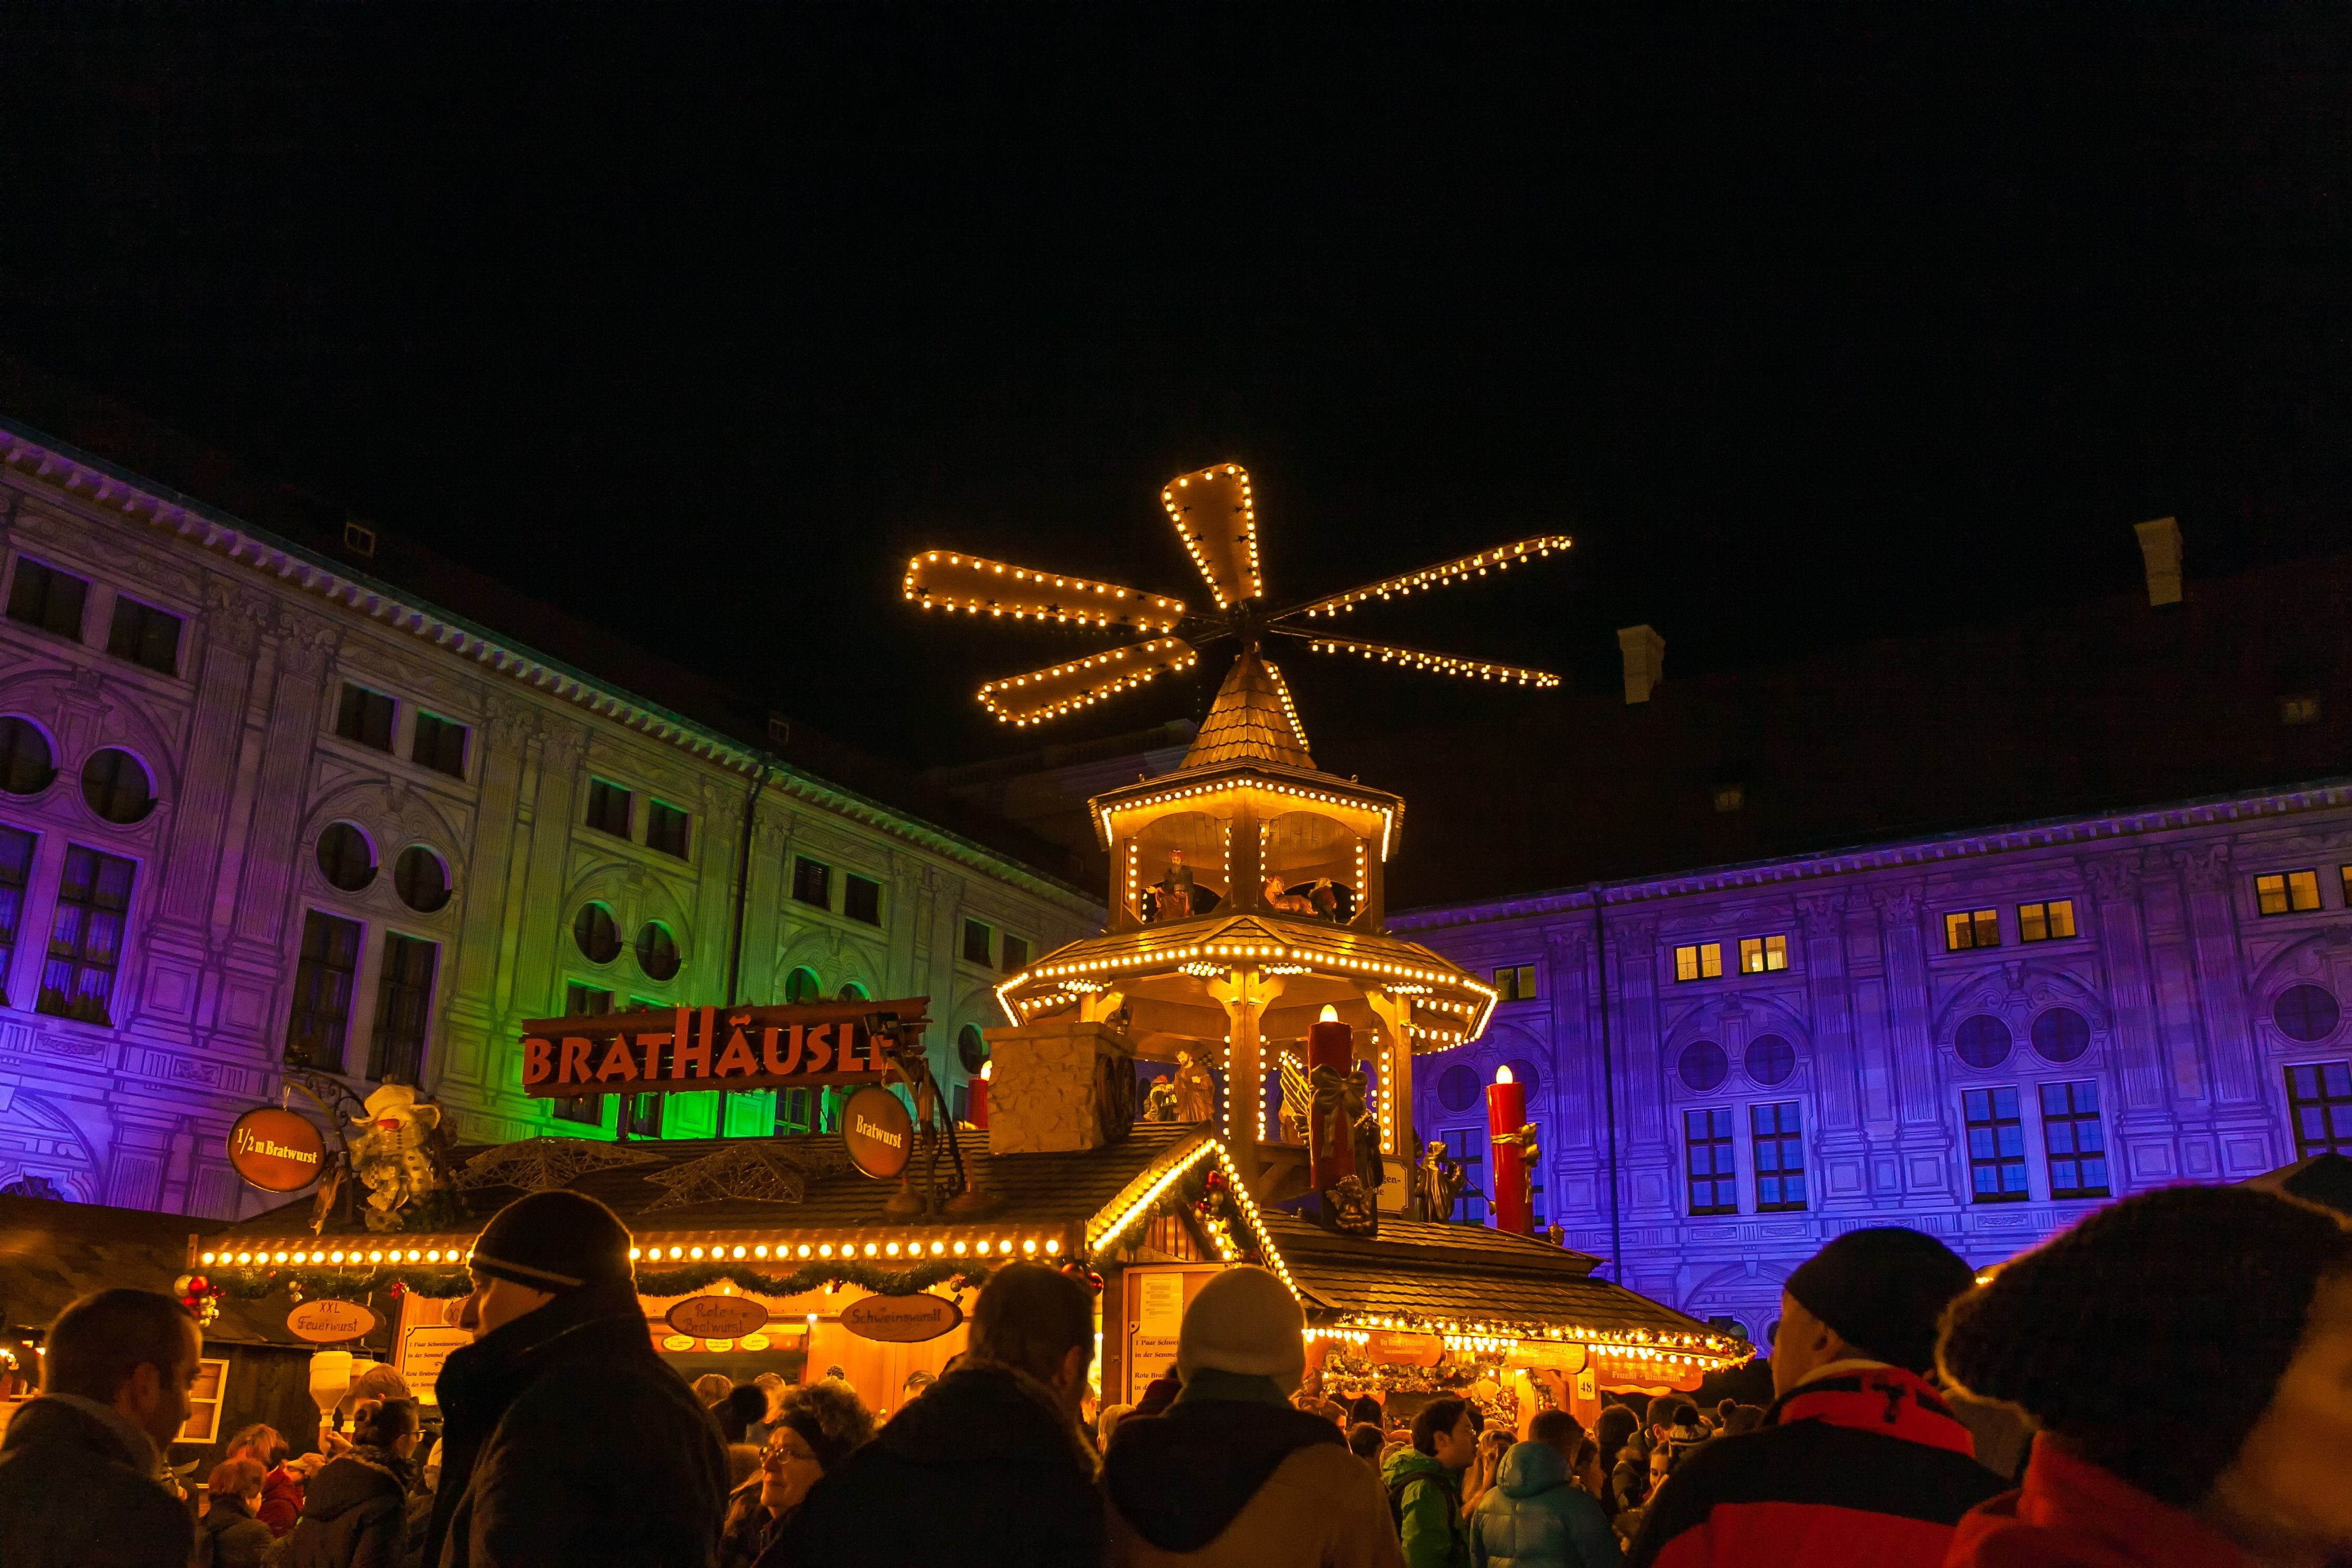 A large, illuminated Christmas pyramid overlooks a bustling Christmas market at night.